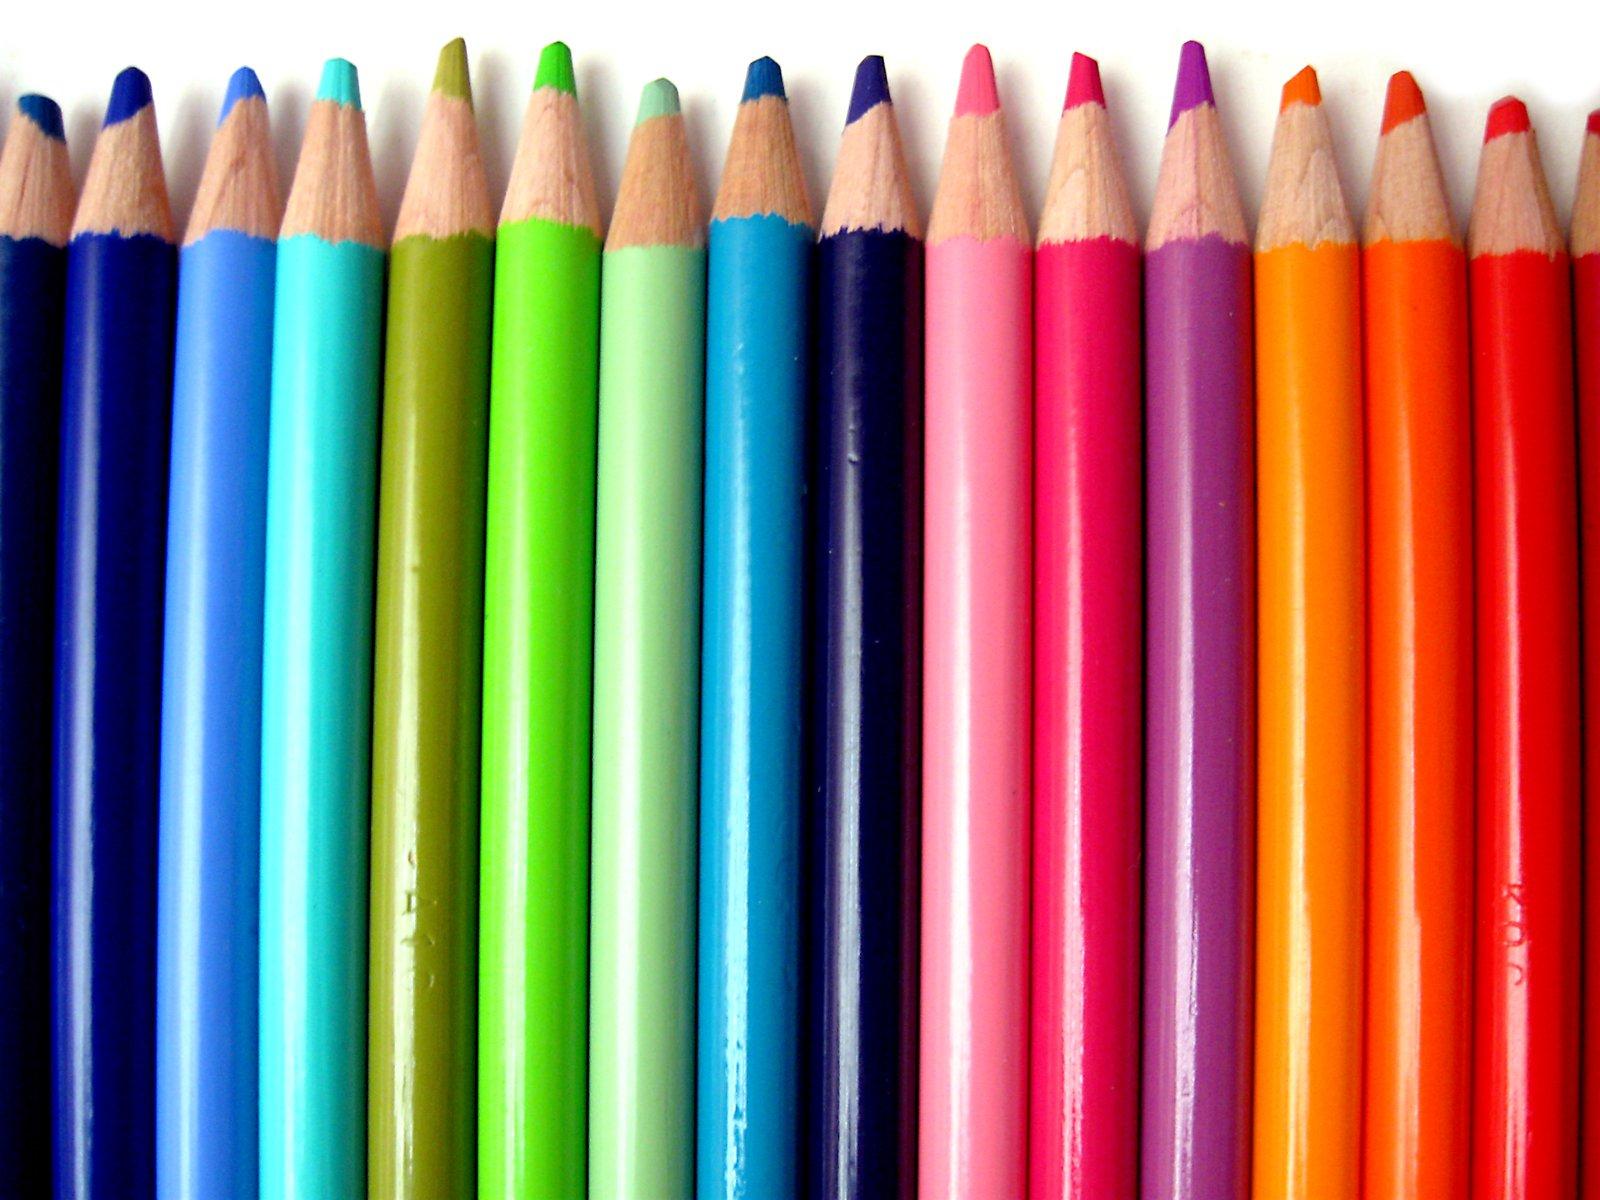 73 Crayons De Couleur Illustrations, Royalty-Free Vector Graphics & Clip Art  - iStock